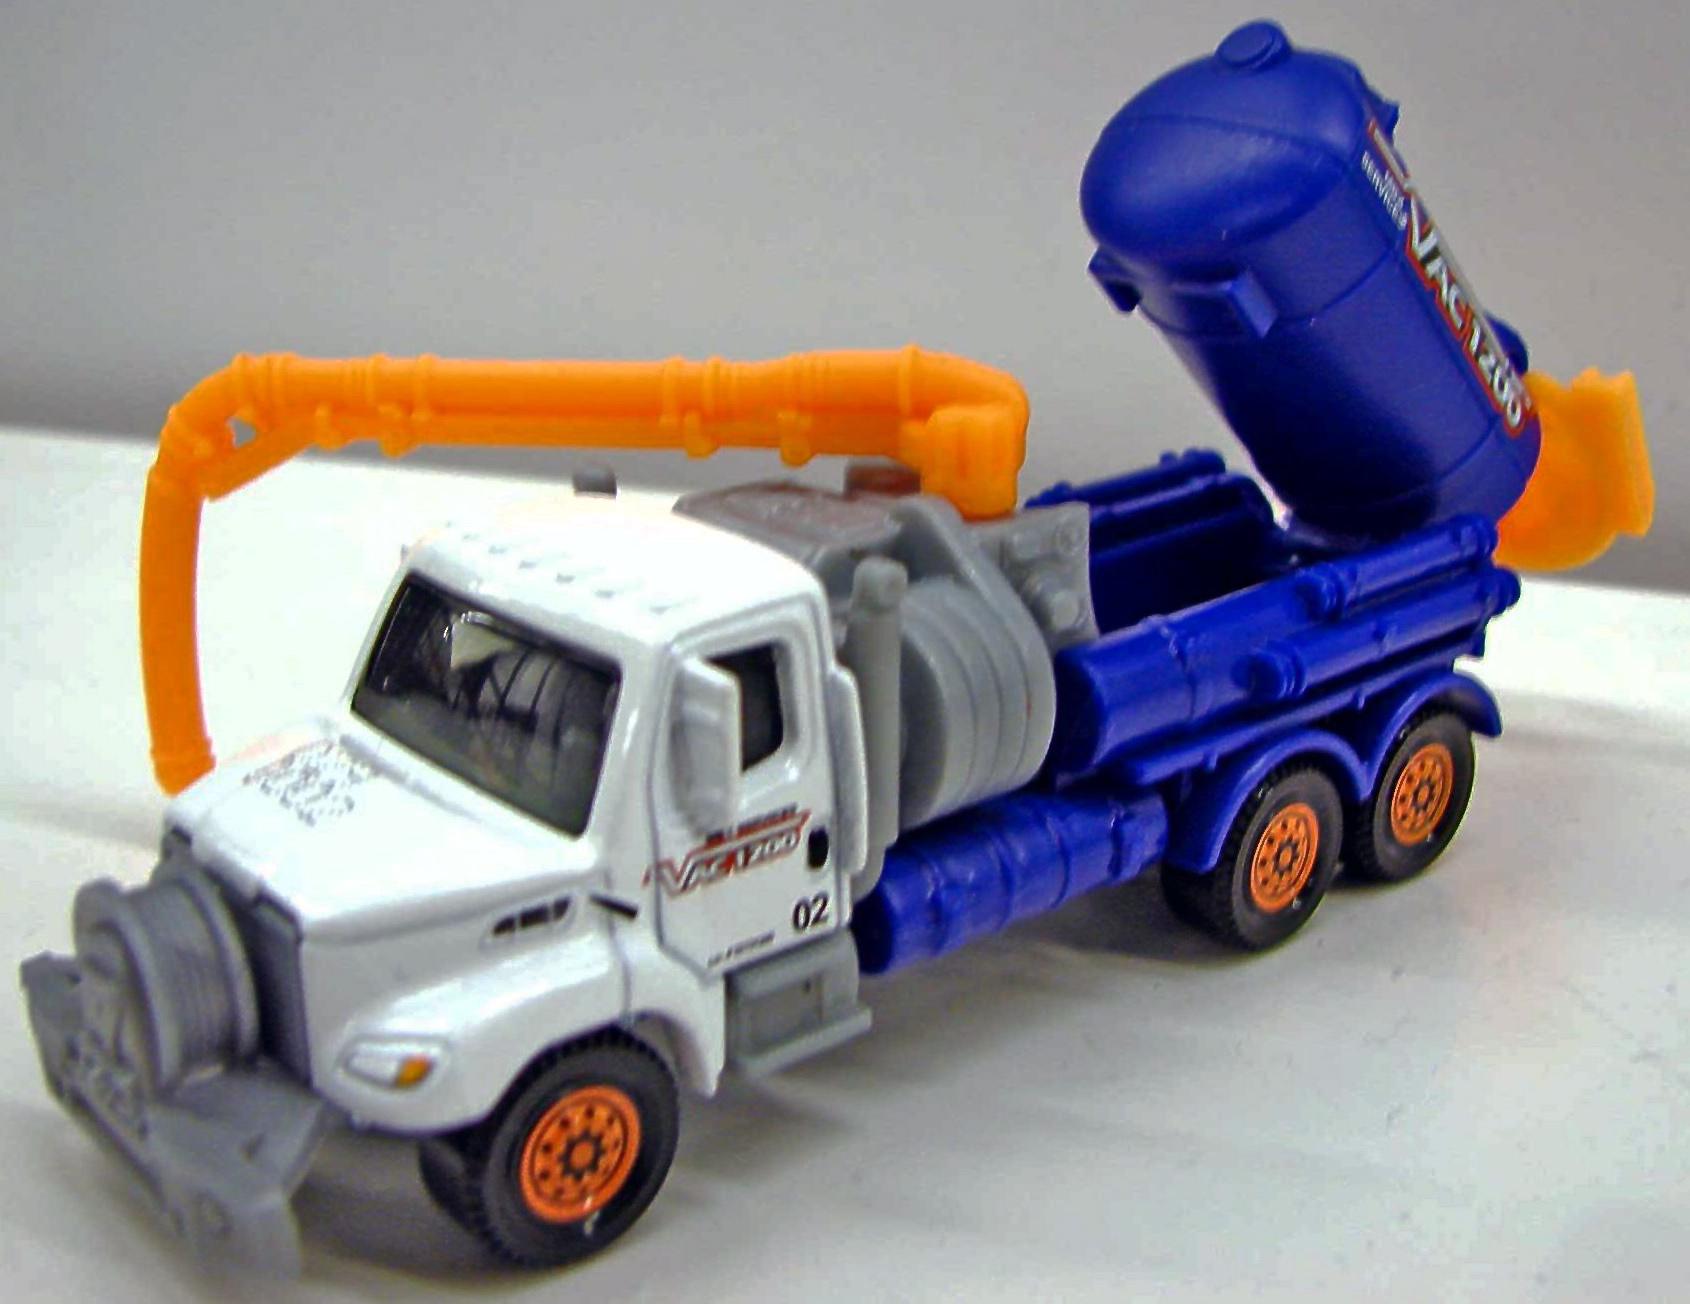 Freightliner Business Class M2 106 Vacuum Truck